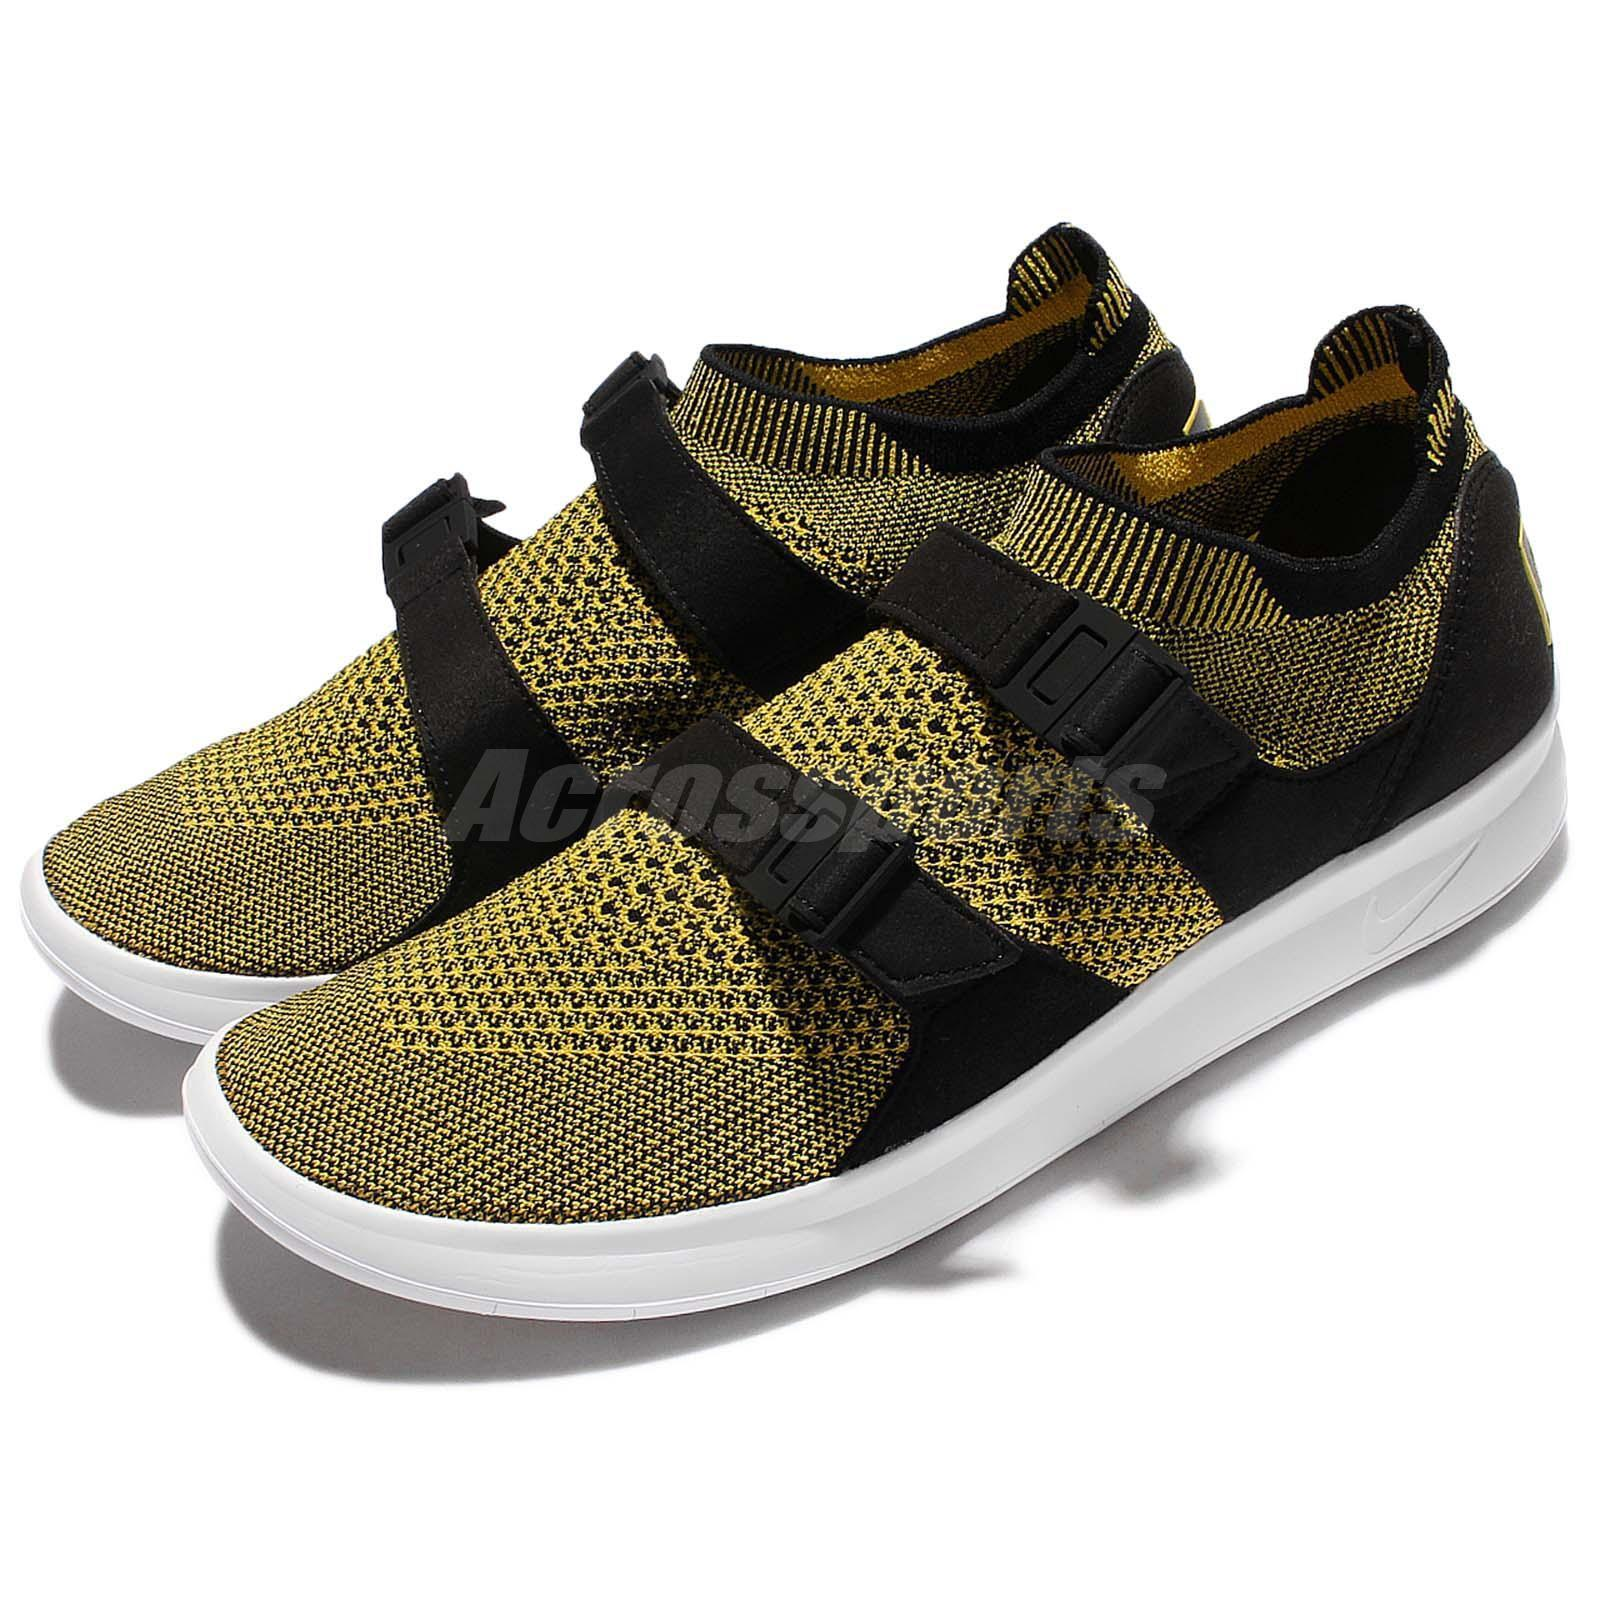 Nike Men's Air Sockracer Flyknit Running Training Shoes Yellow Strike 898022 700